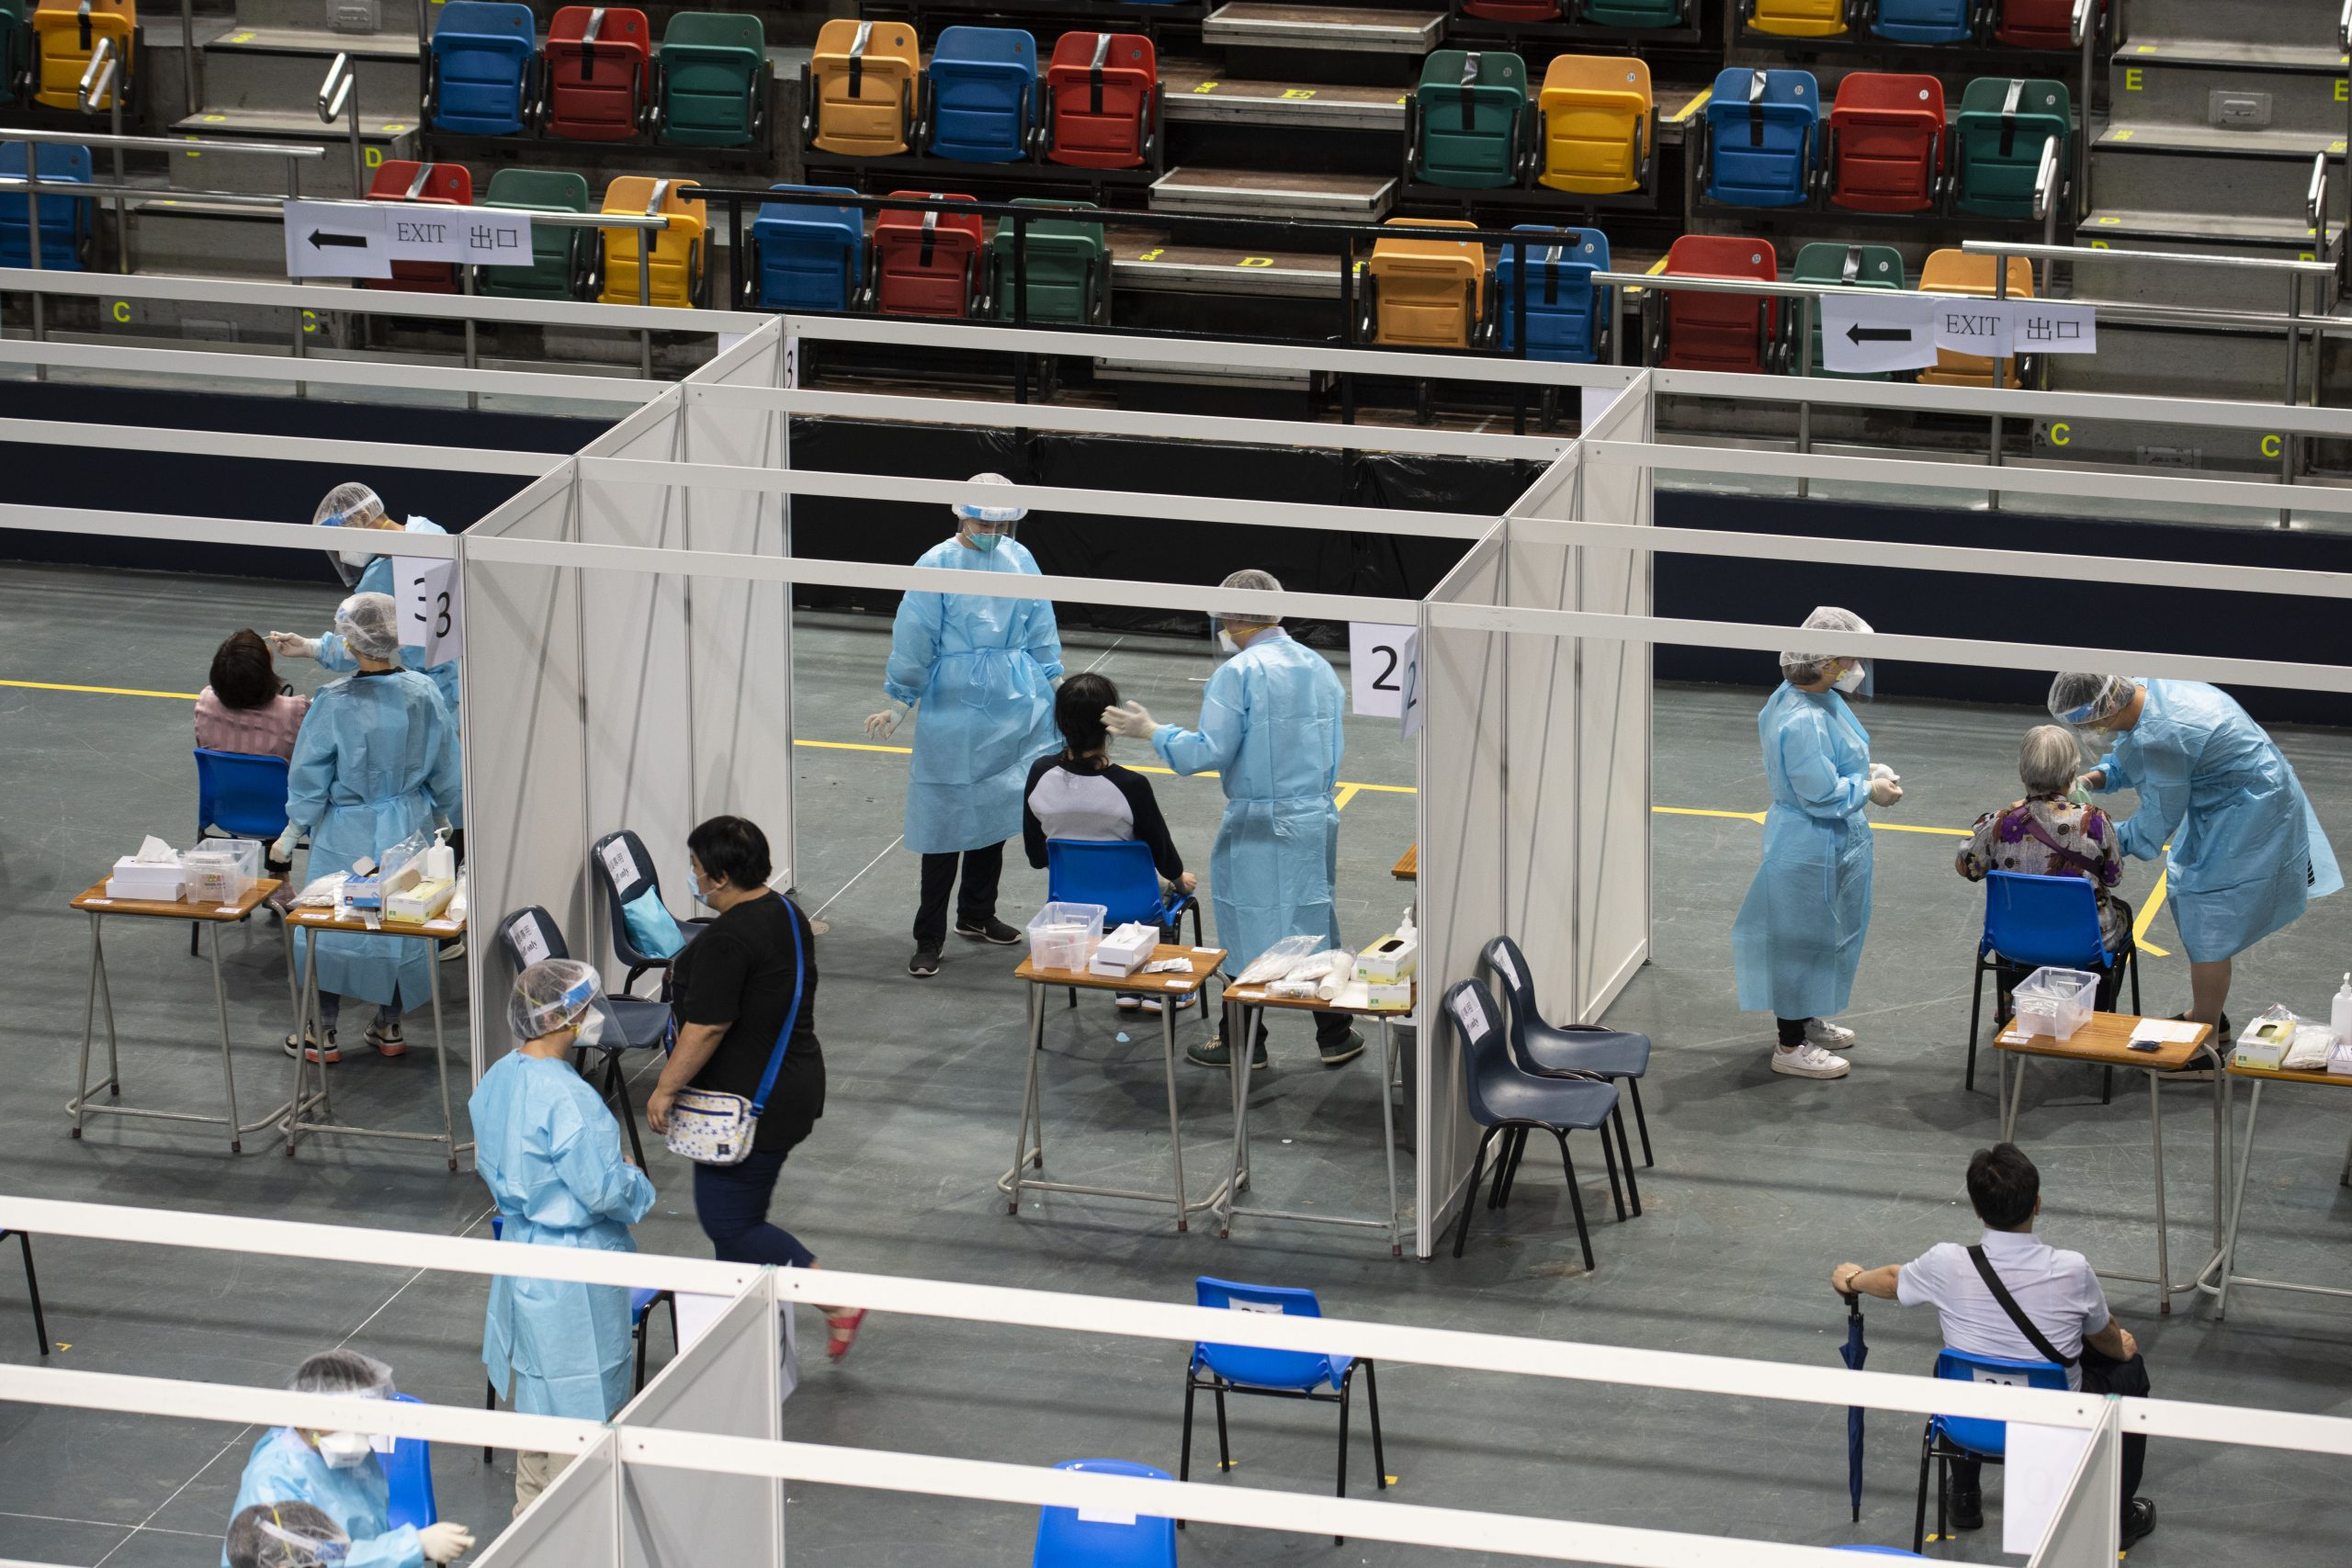 Covid-19 testing facilities